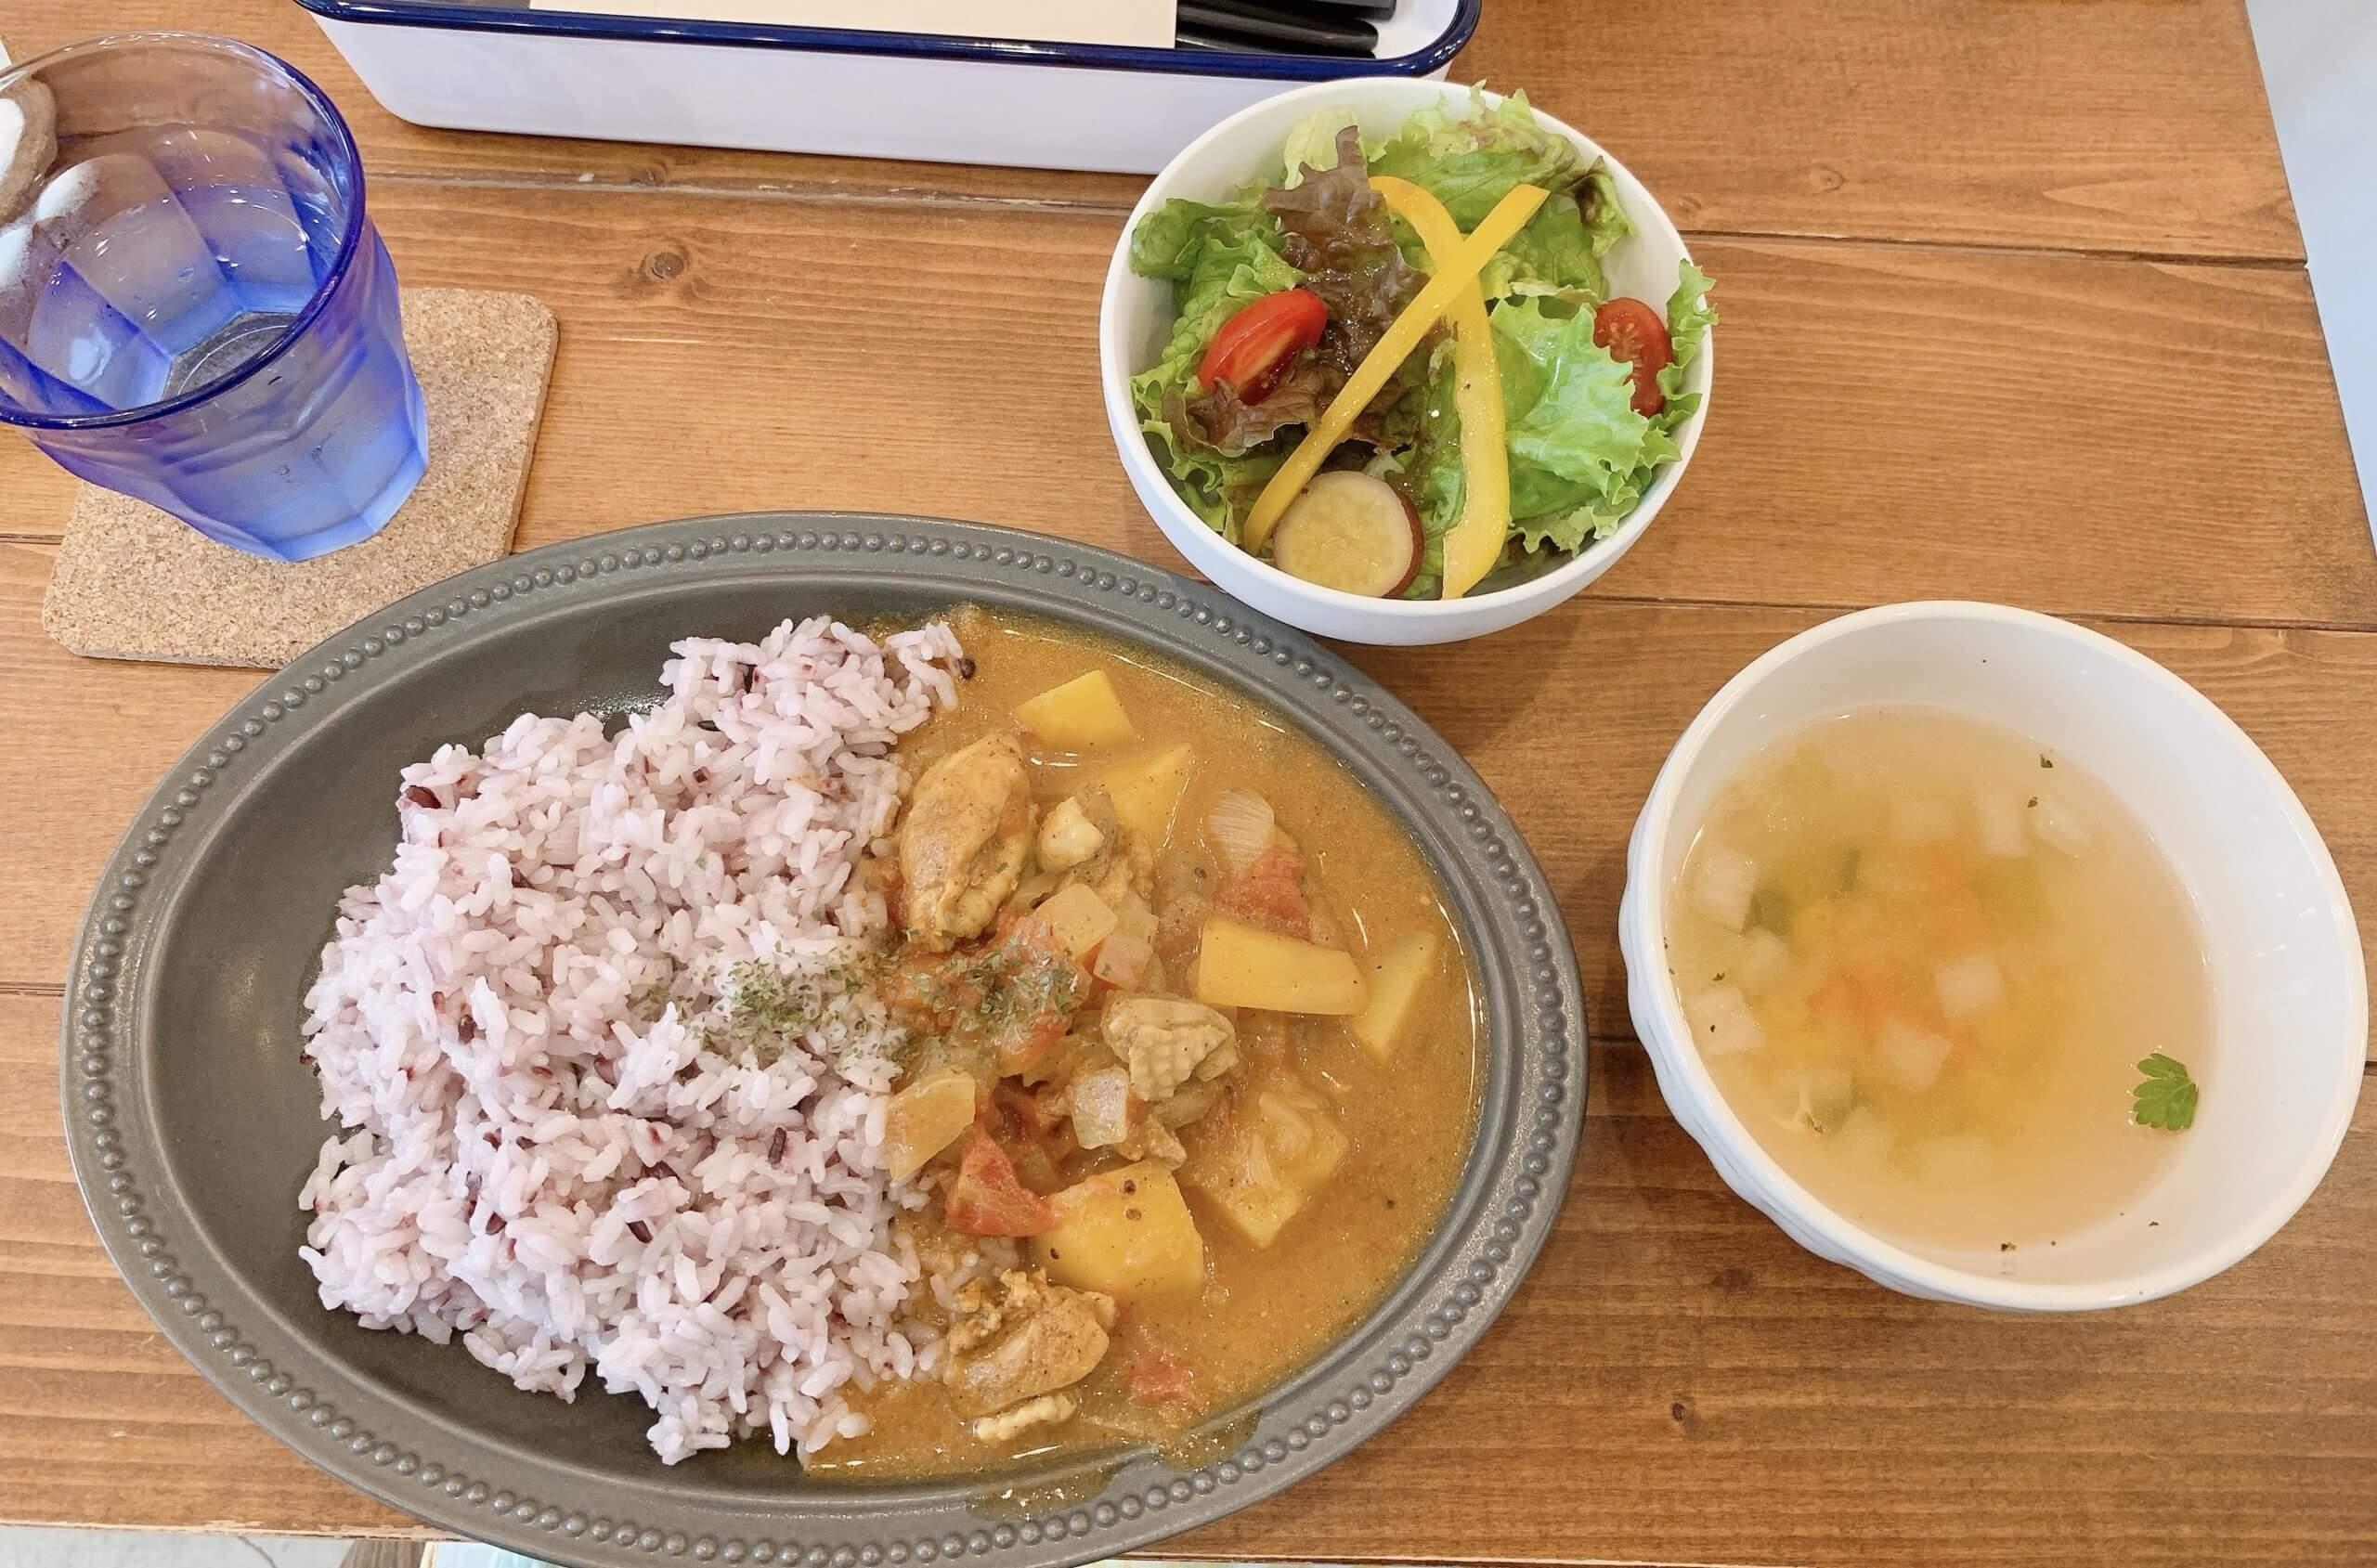 【CAFE AZUR(カフェ アズール)】おしゃれと可愛いであふれているカフェ!【熊本市東区小峯】